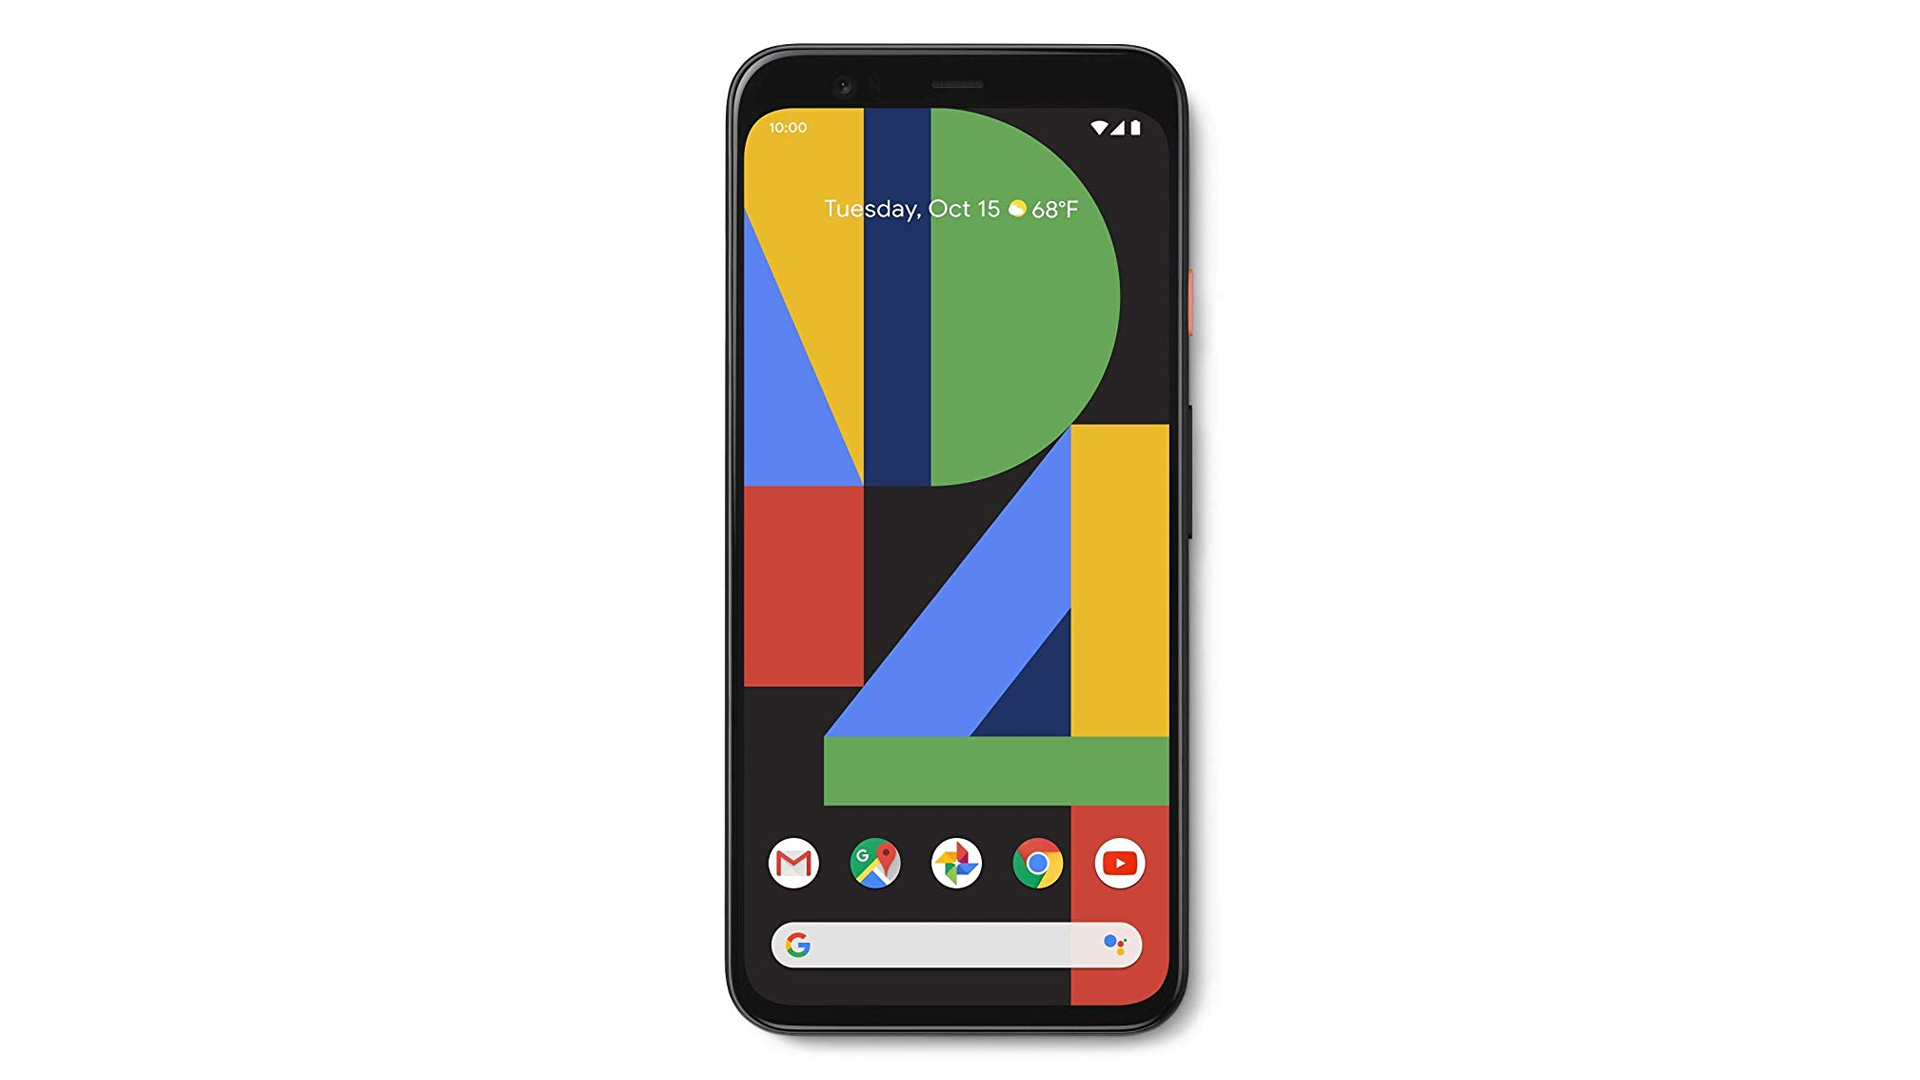 The Google Pixel 4